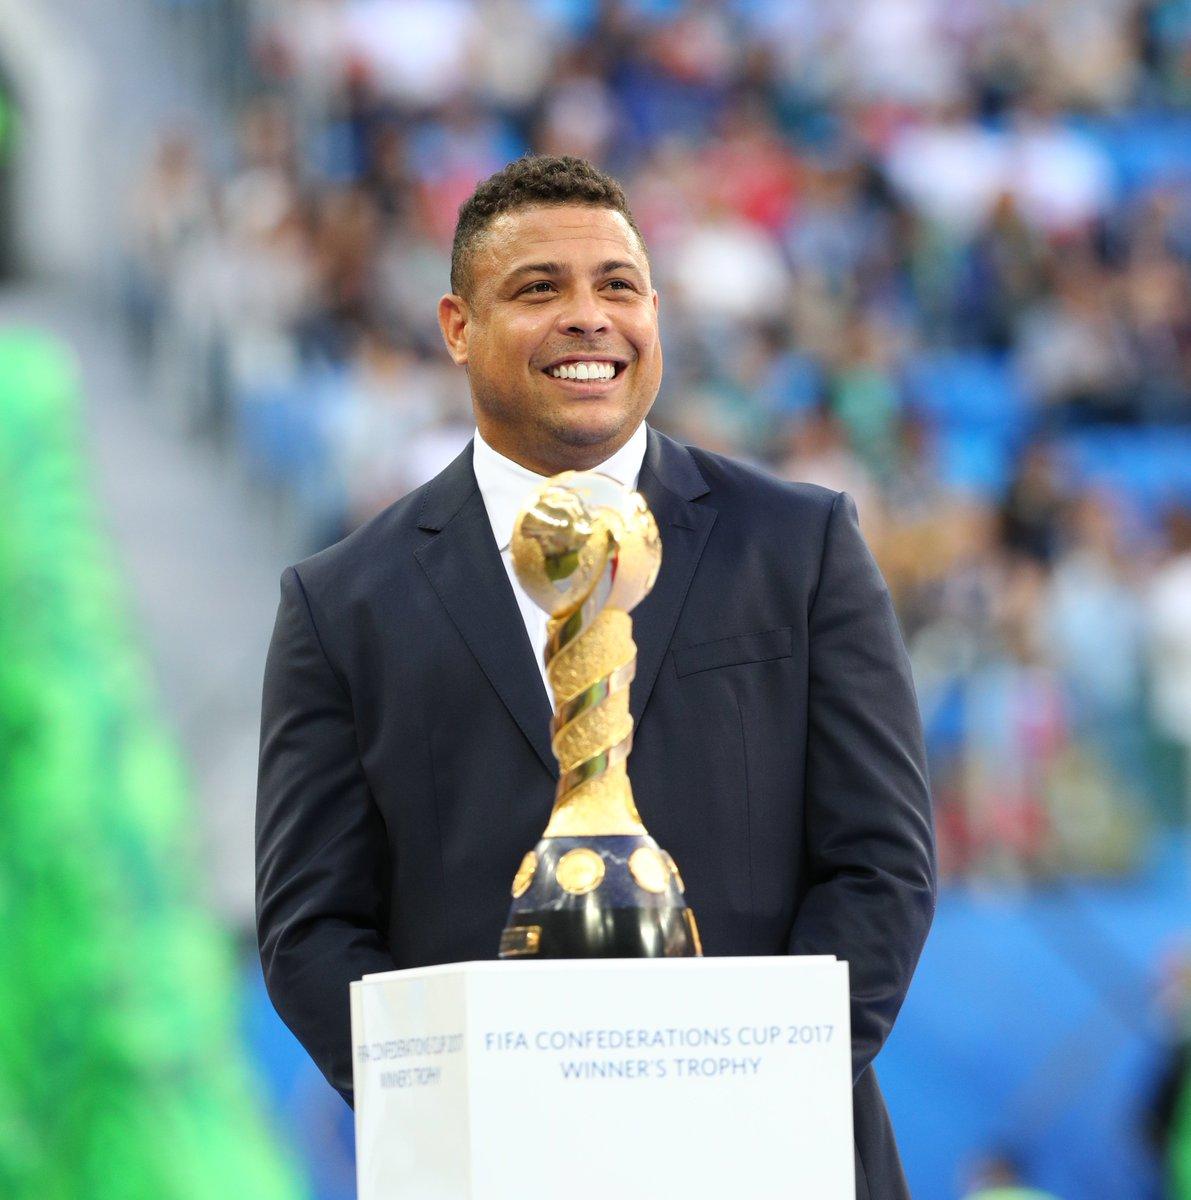 RT @fifacom_es: Un goleador nunca falta a su cita con las finales.  ¡Hola, @Ronaldo! 👋🇧🇷  #CHIGER 🇨🇱🇩🇪 #ConfedCup https://t.co/OHAwZquAVf